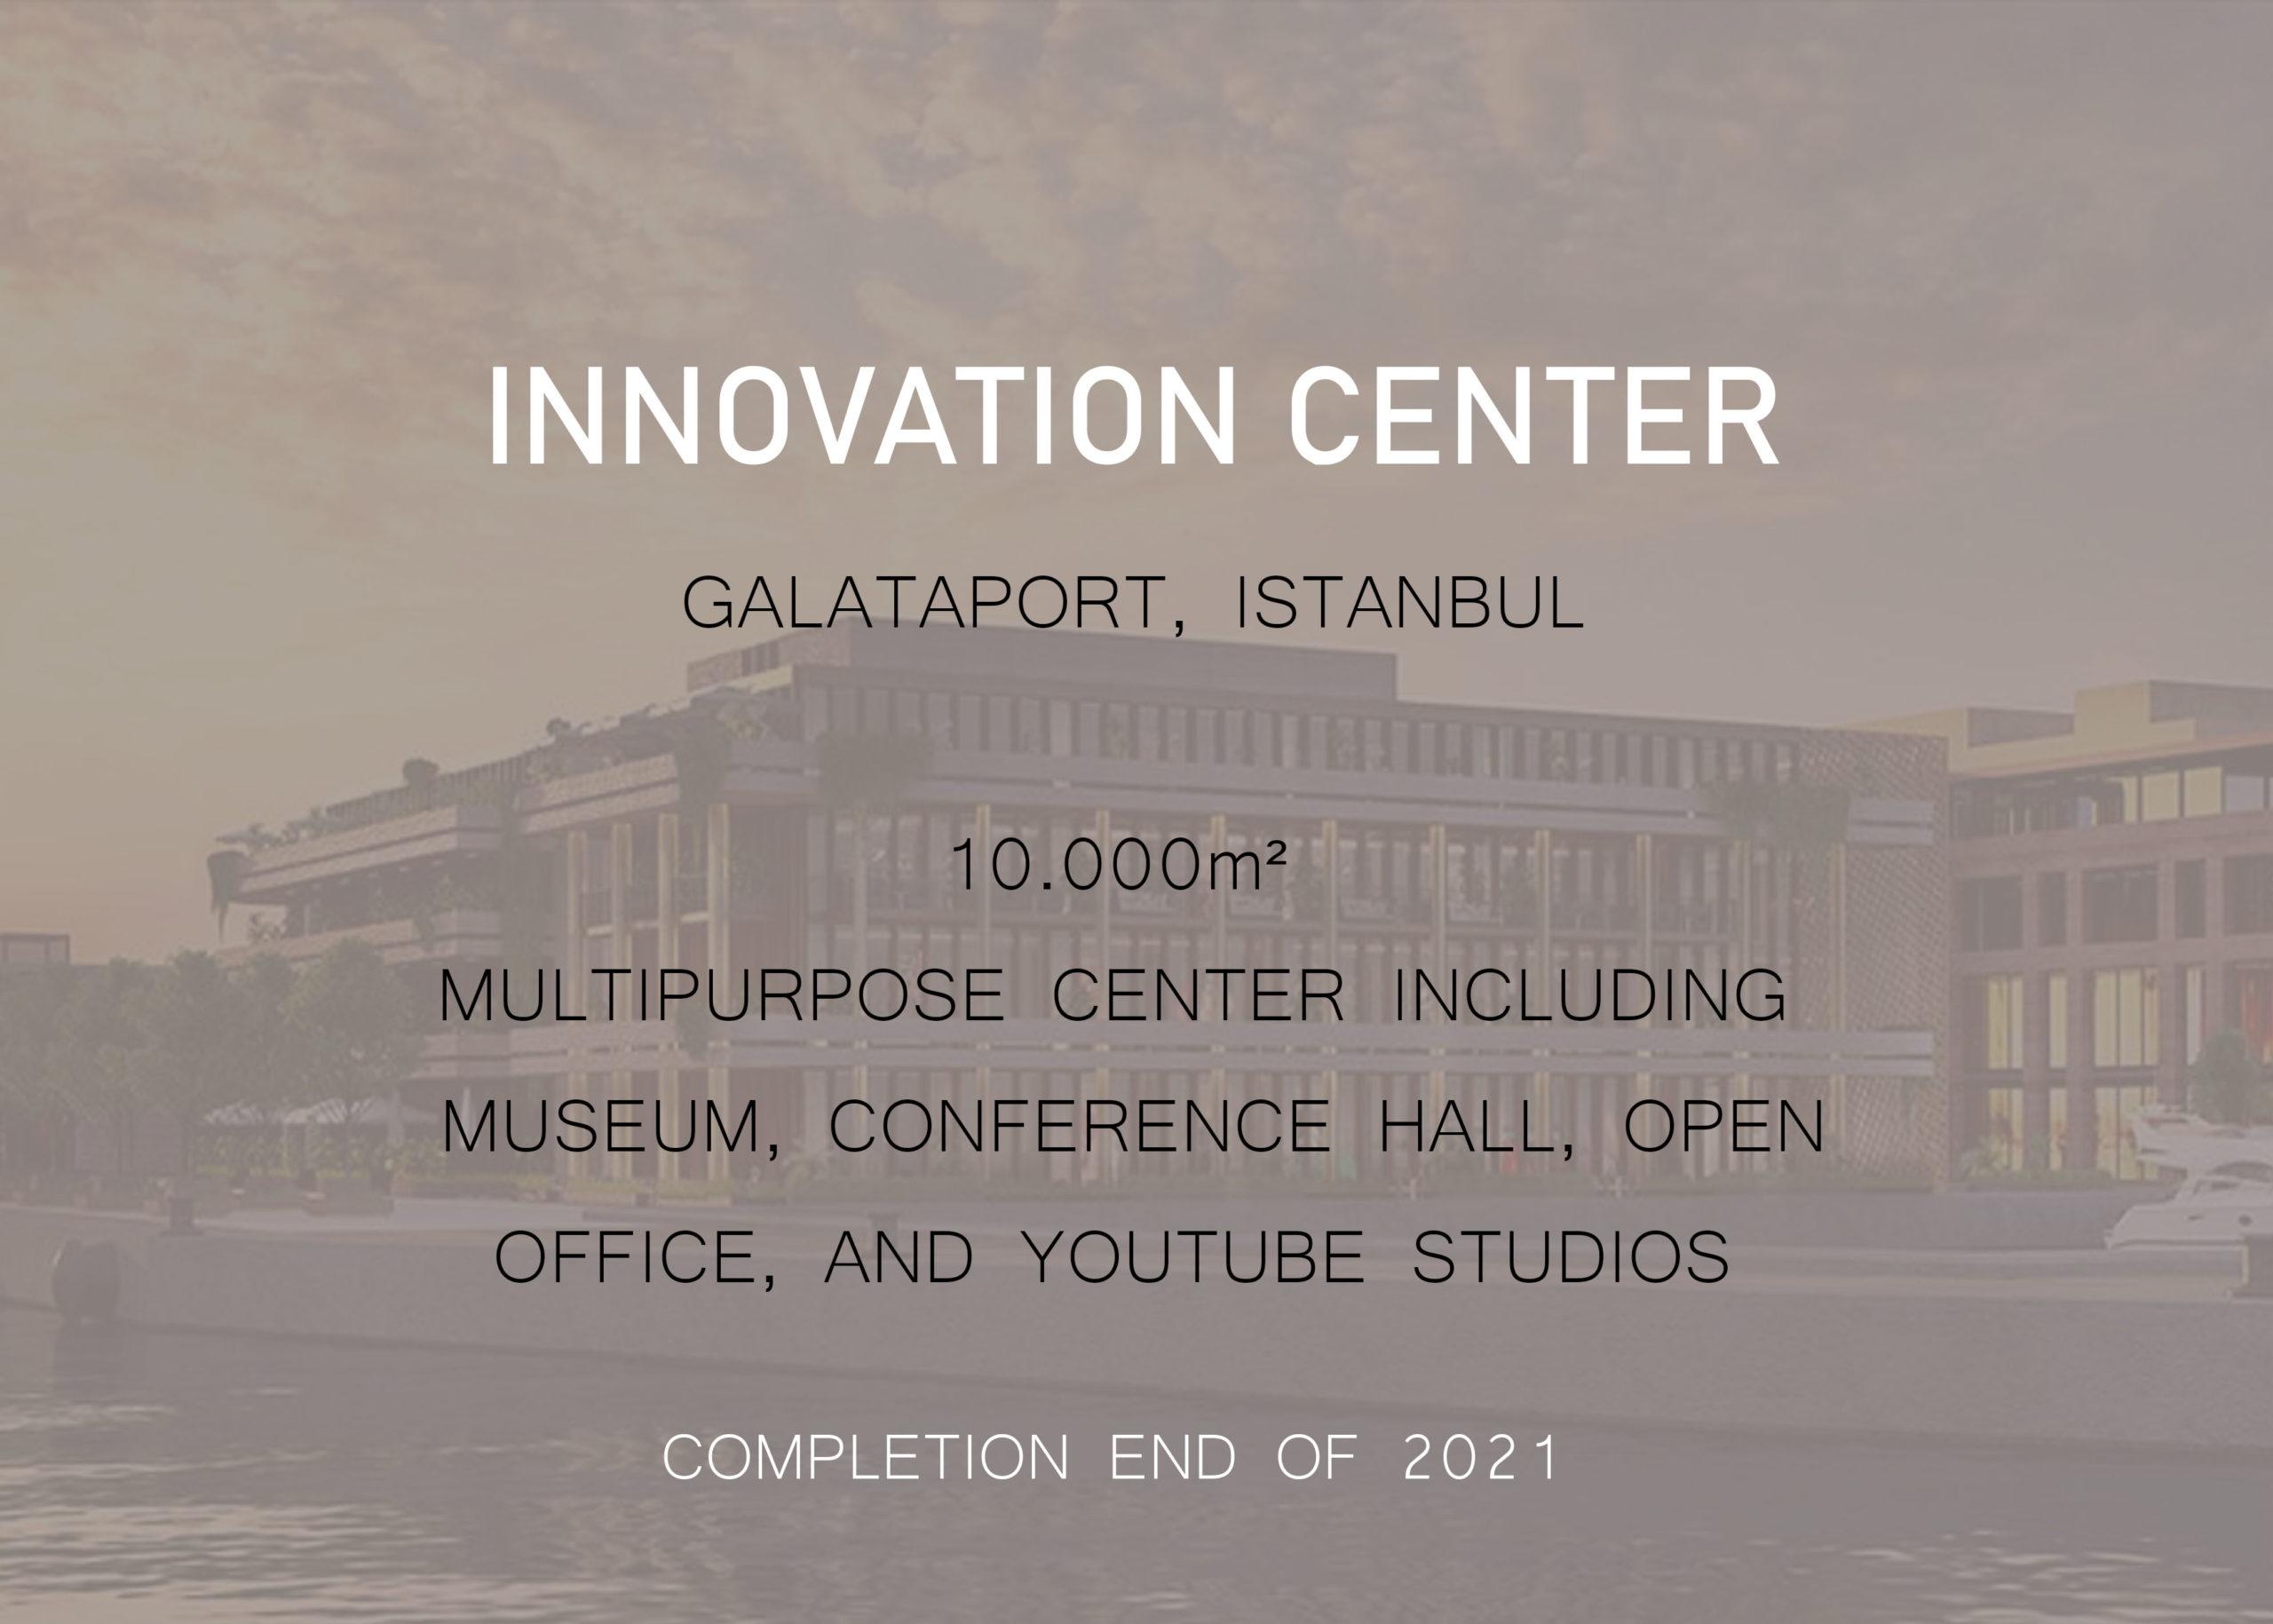 INNOVATION CENTER – Galataport